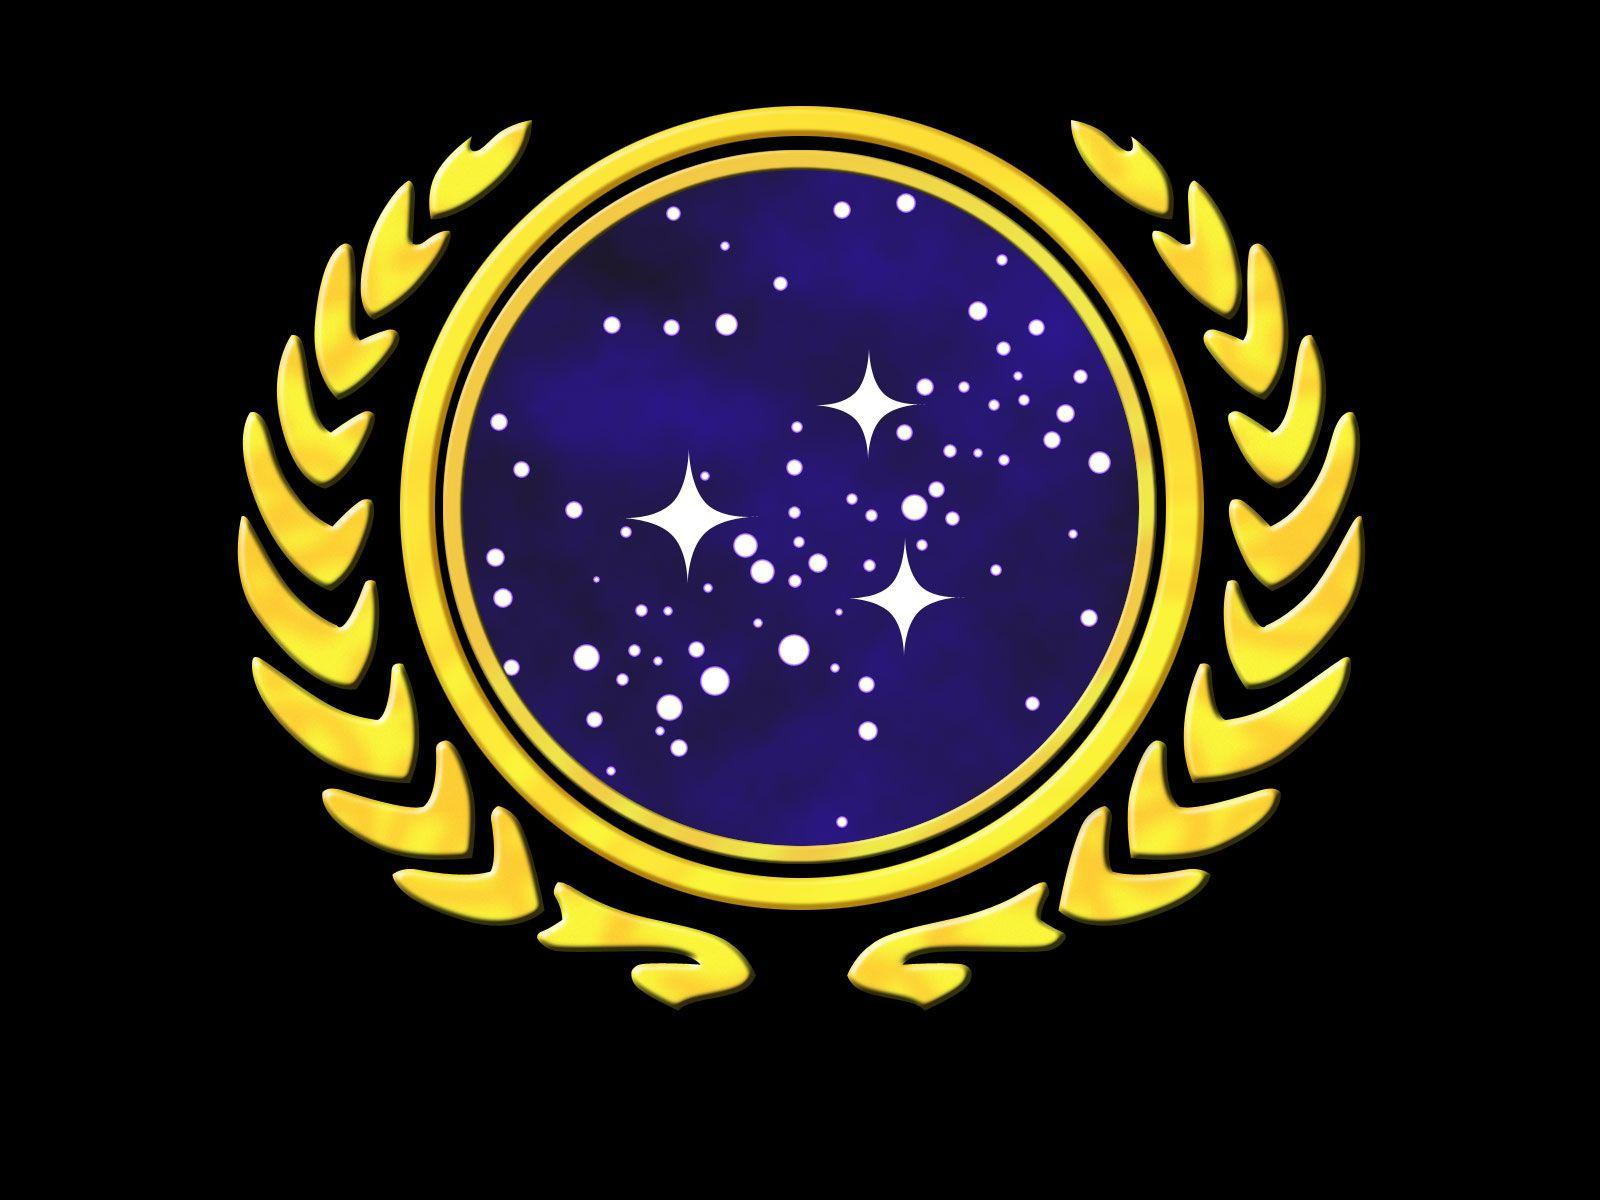 star trek starfleet command wallpaper - photo #14